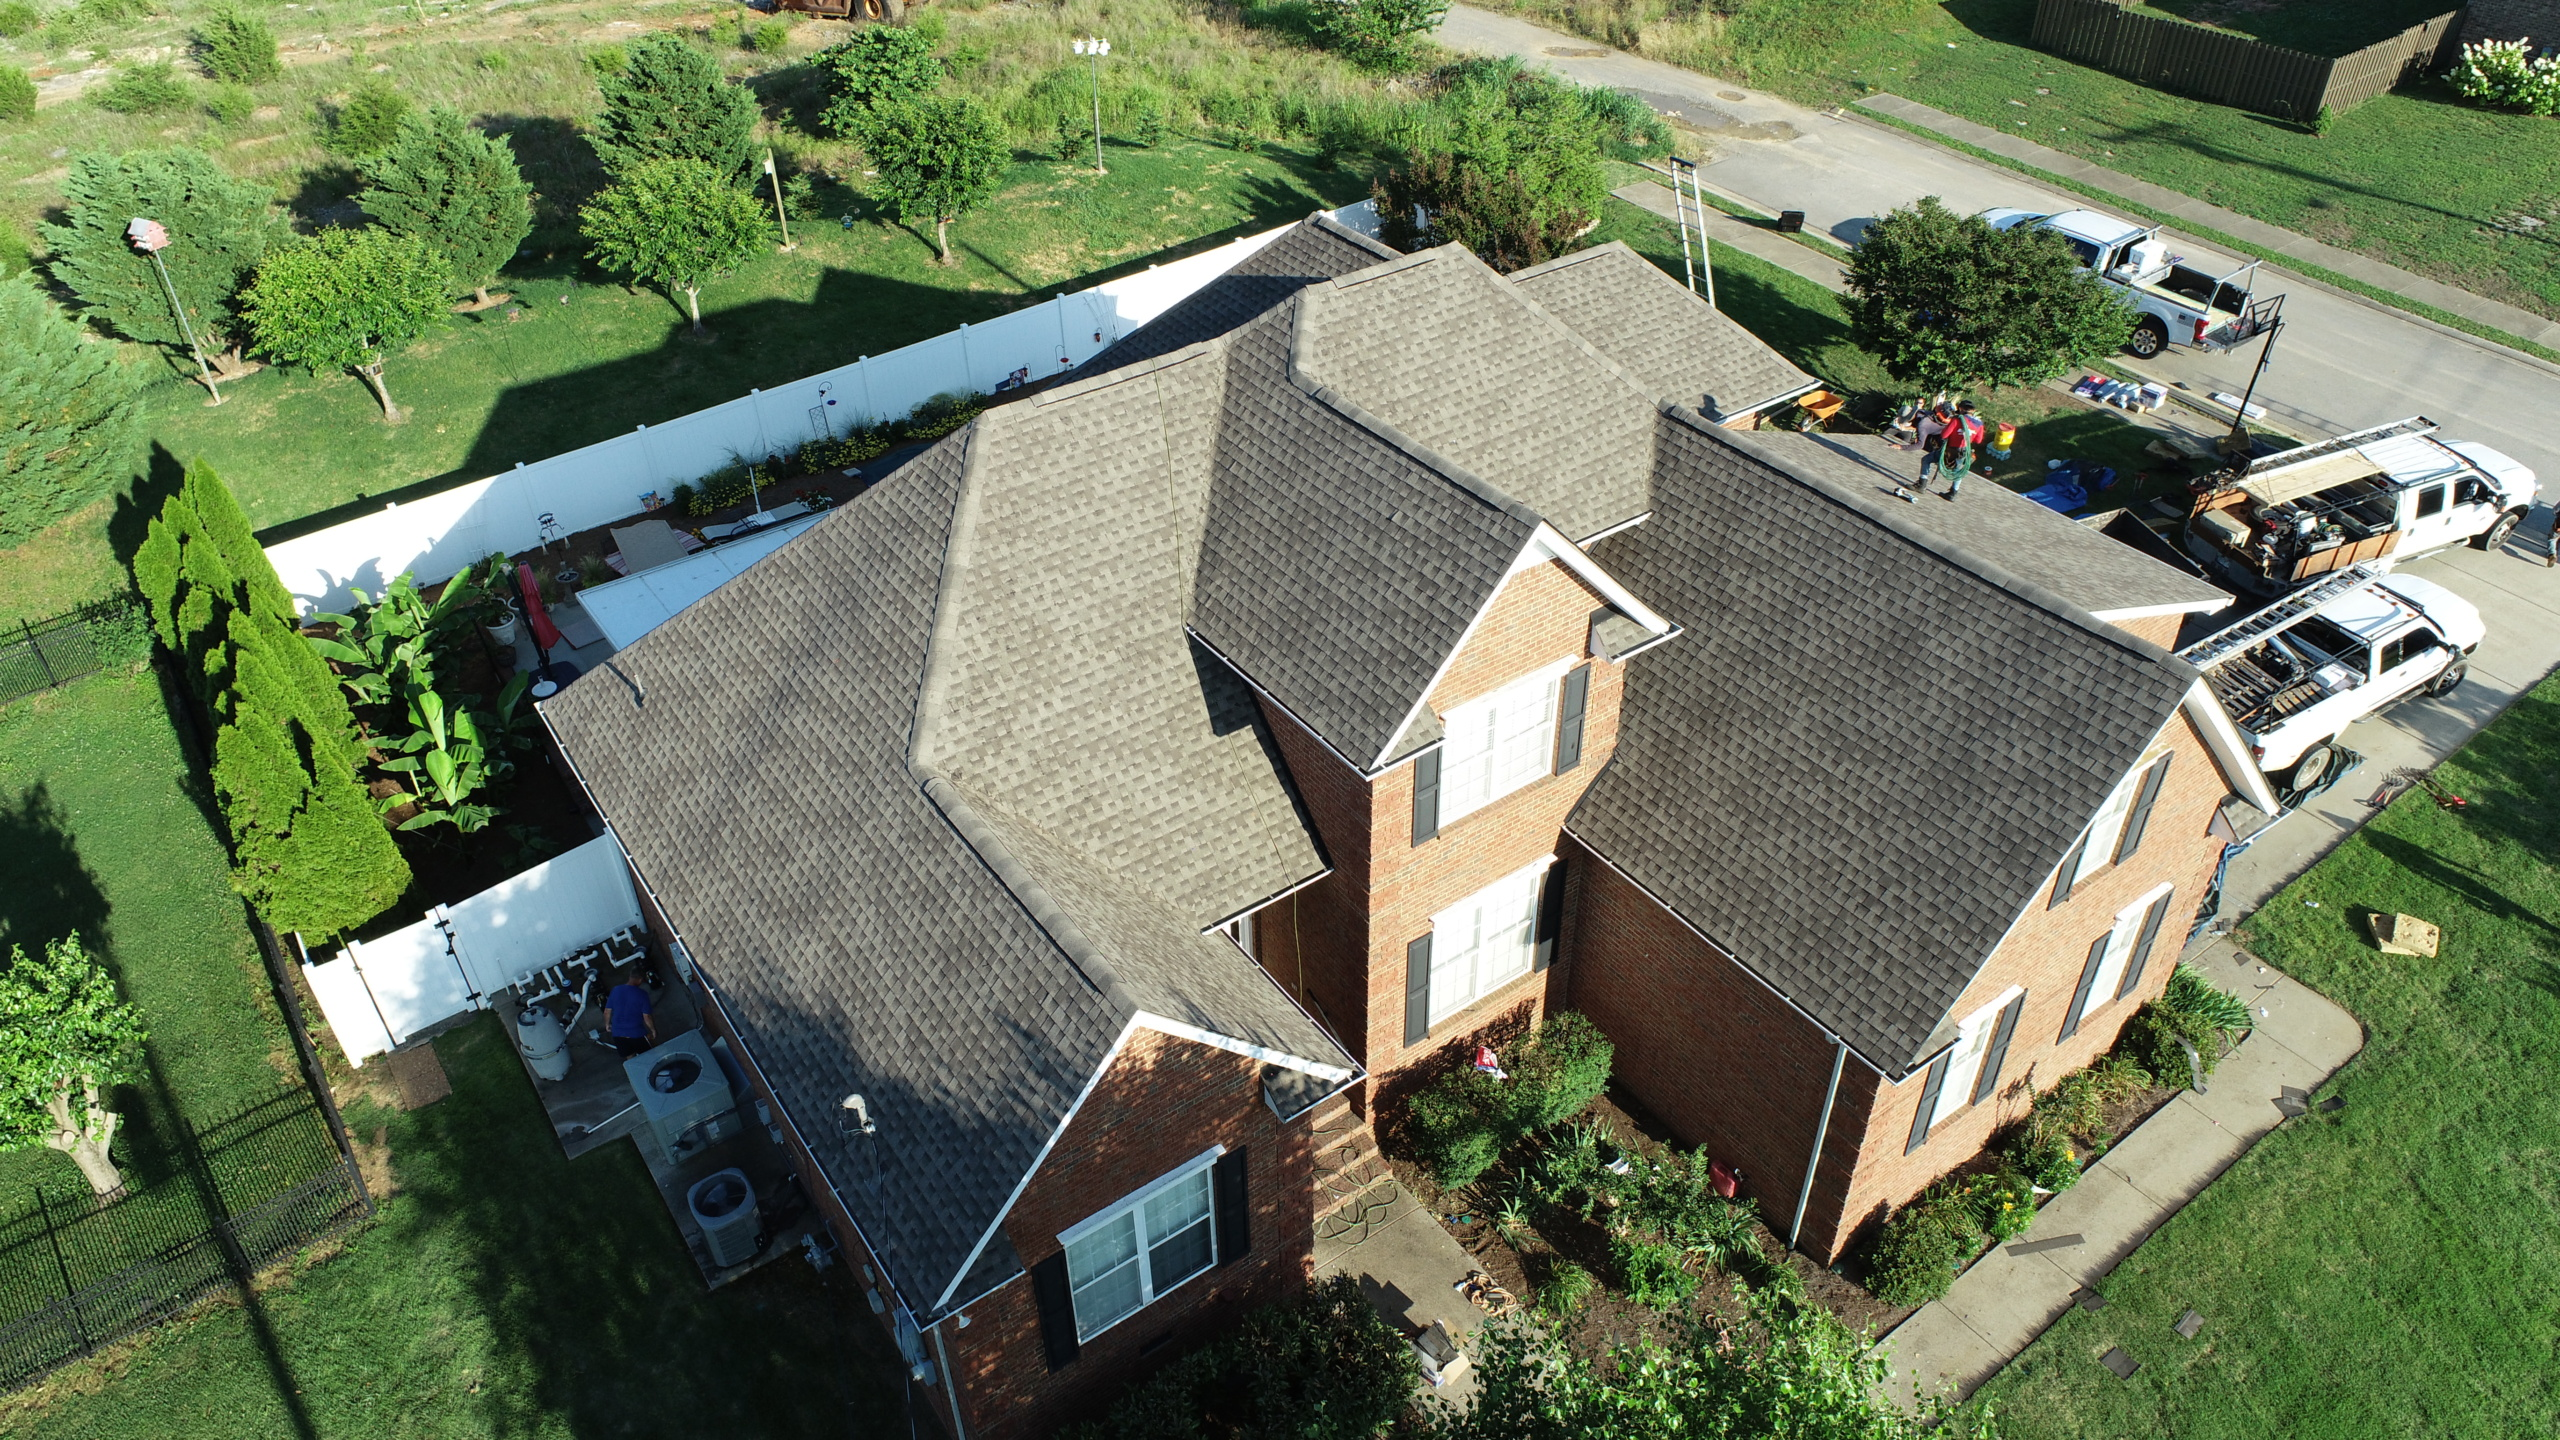 Roofing Murfreesboro GAF Weathered Wood Shingles 3